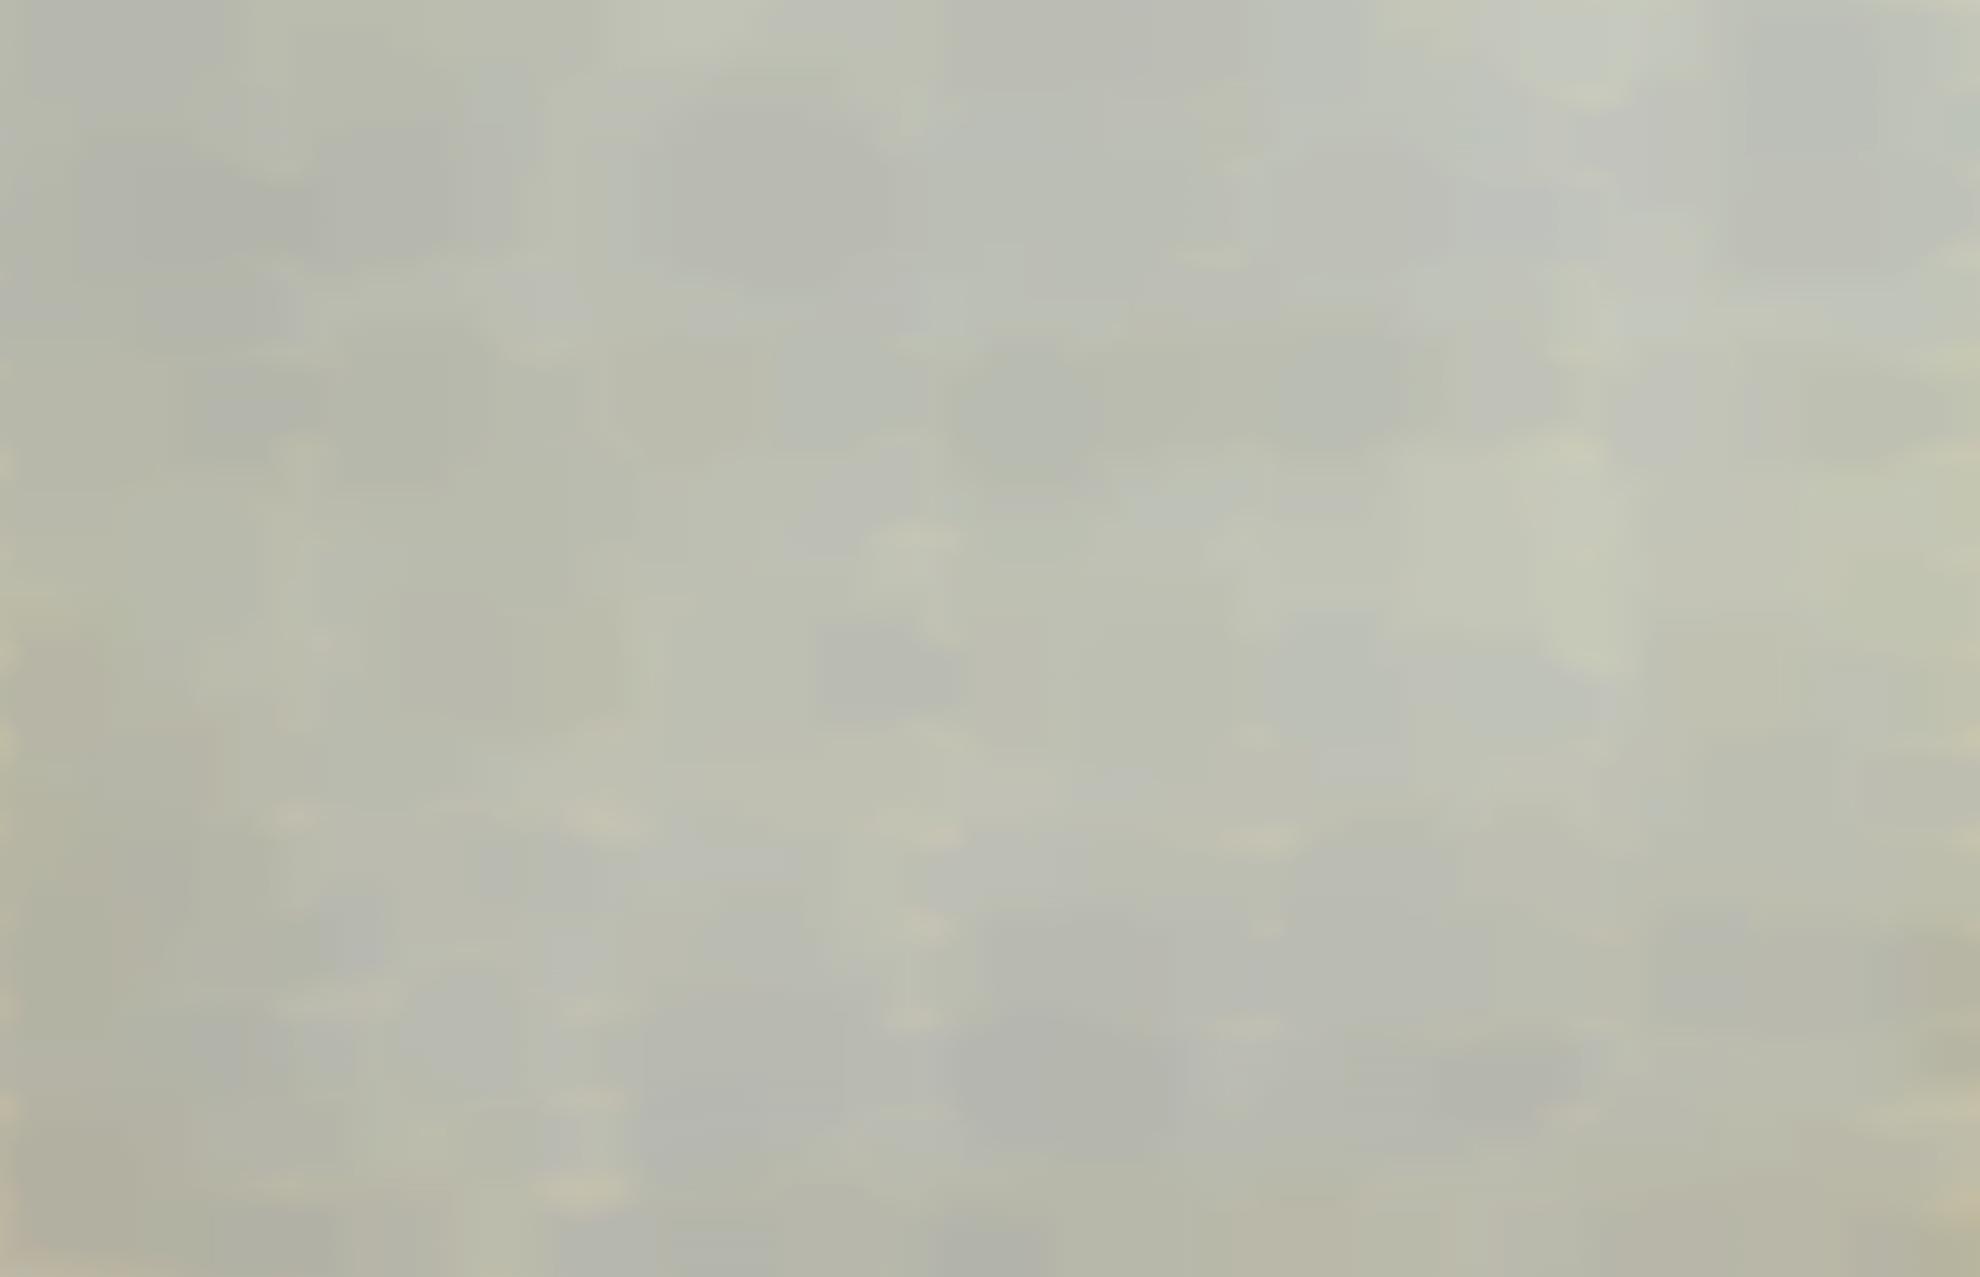 Park Seo-bo-Ecriture No. 37-75-76-1975